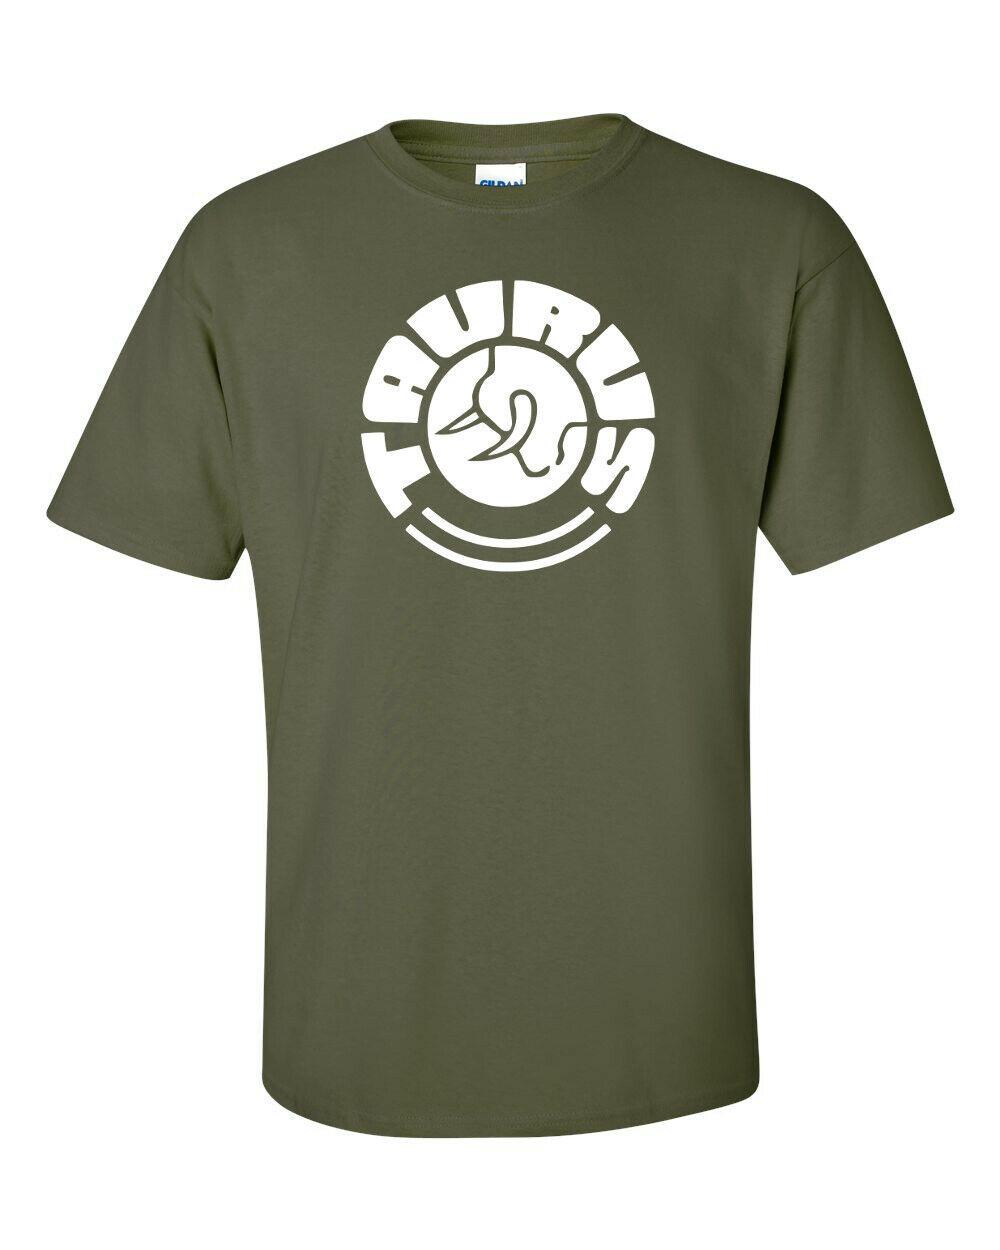 Taurus Firearms White Logo T Shirt 2nd Amendment Pro Gun Rights Rifle Pistol Tee image 5